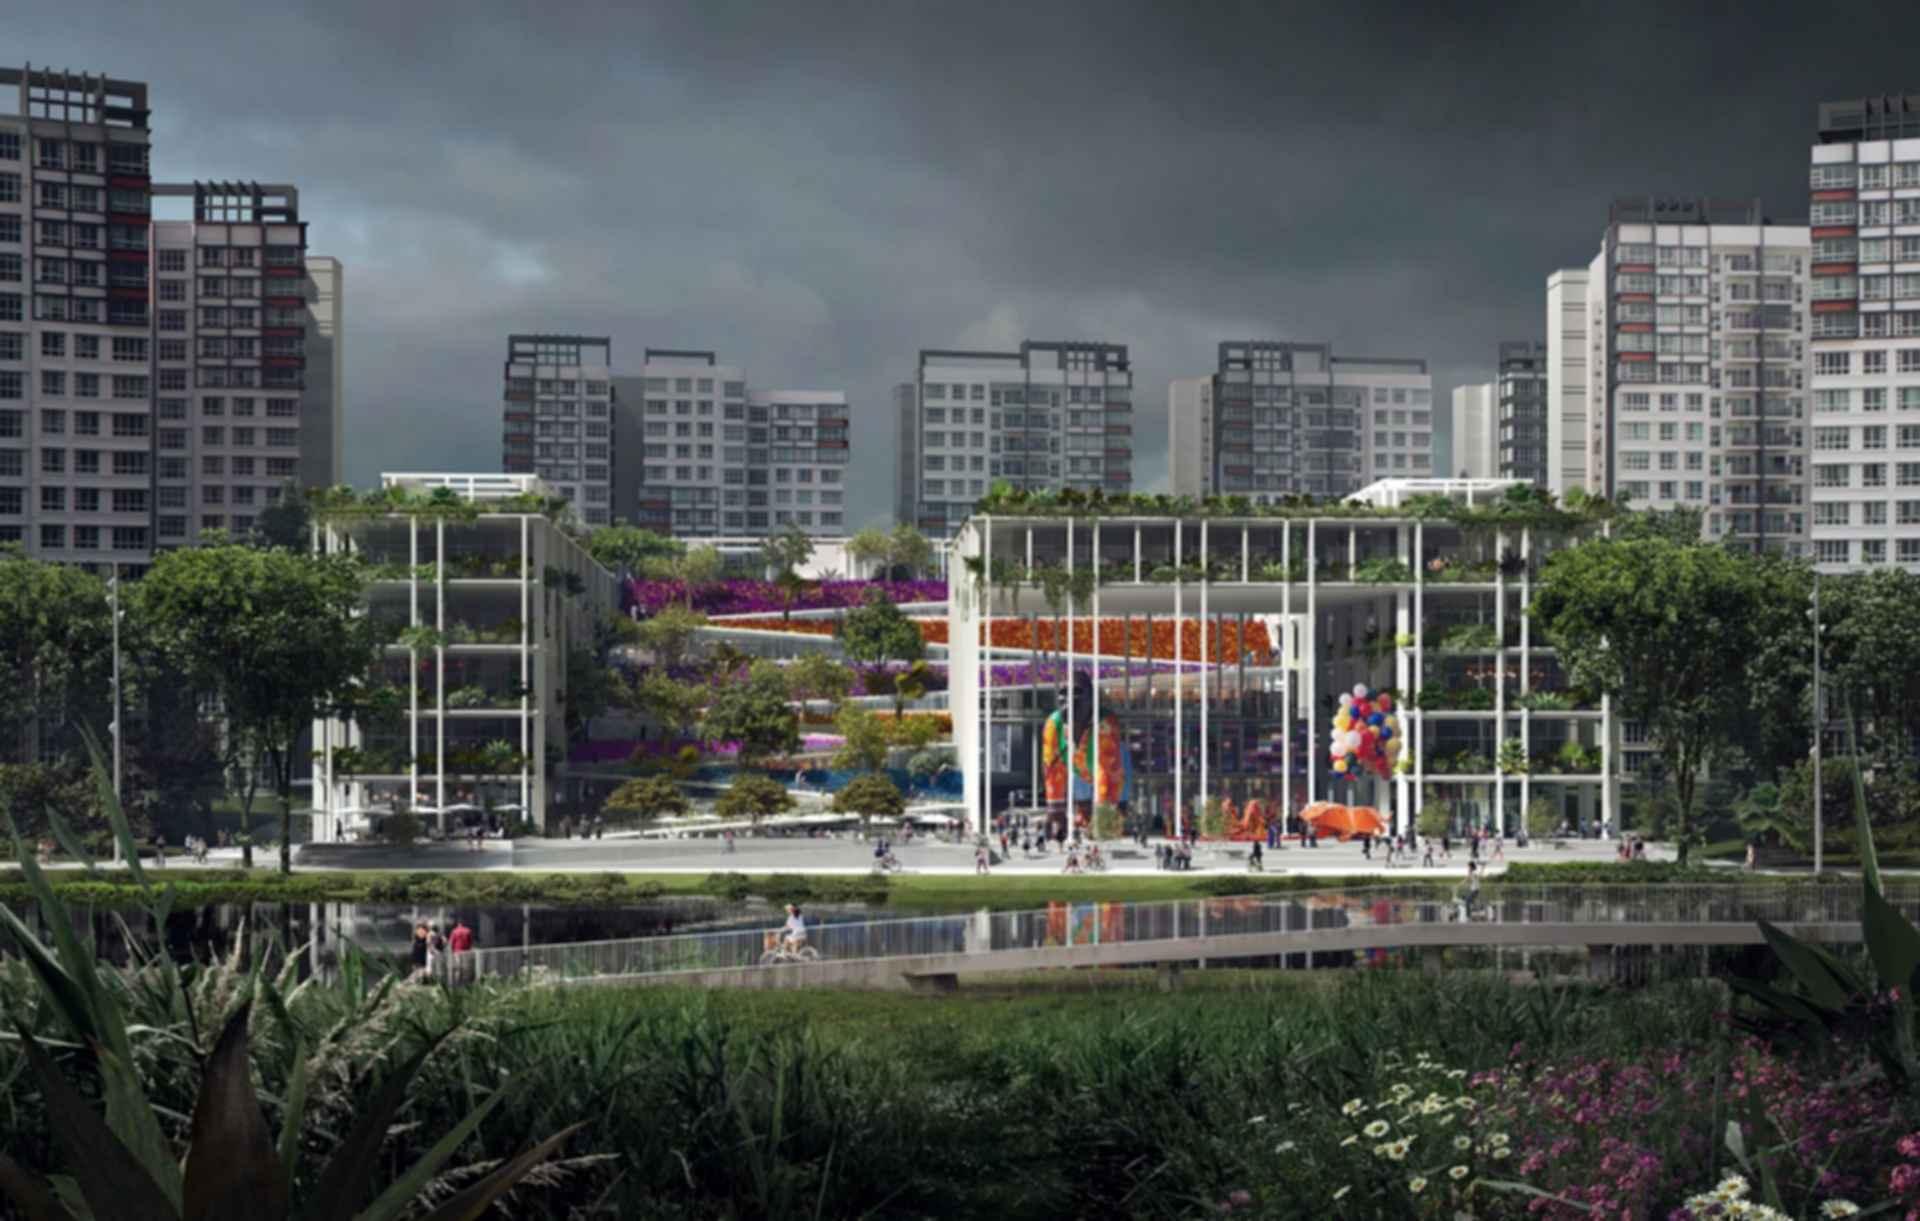 Oasis Terrace - Concept design